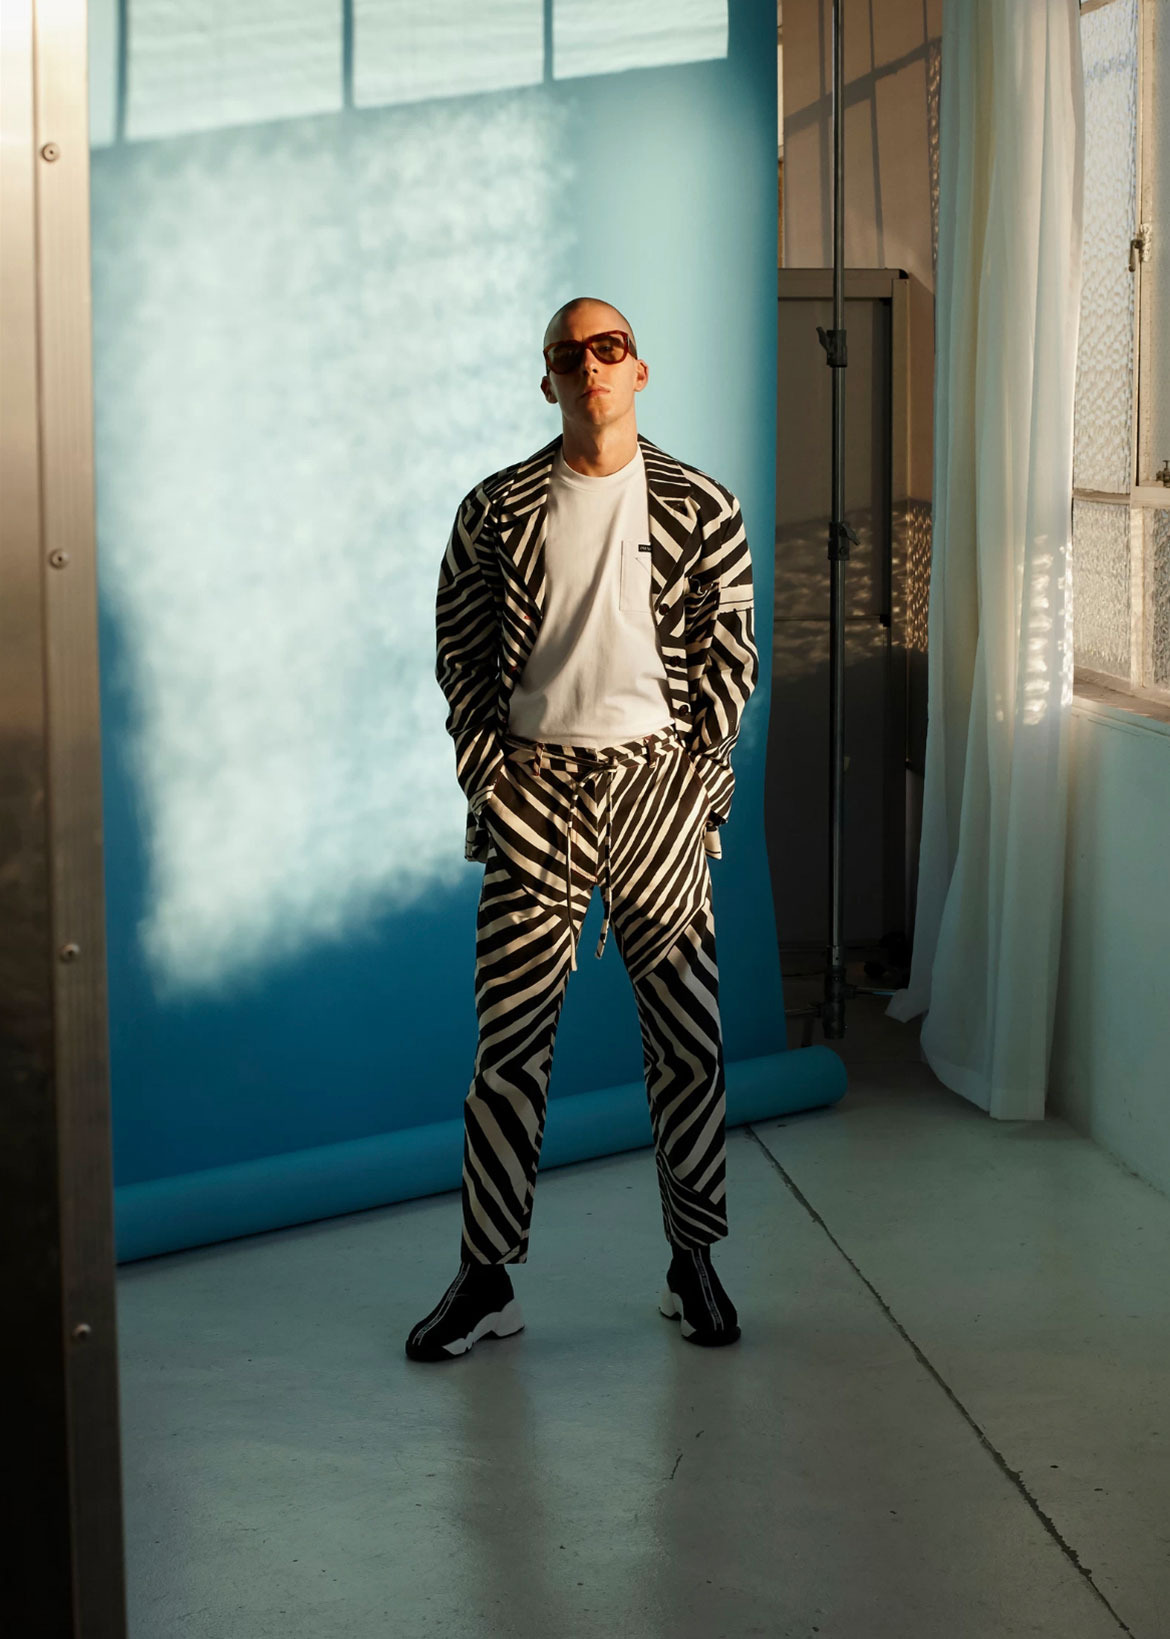 Matthew Gode, choreographer, wears jacket and pants Lisa Waup x Verner, t-shirt Prada, shoes Dior.